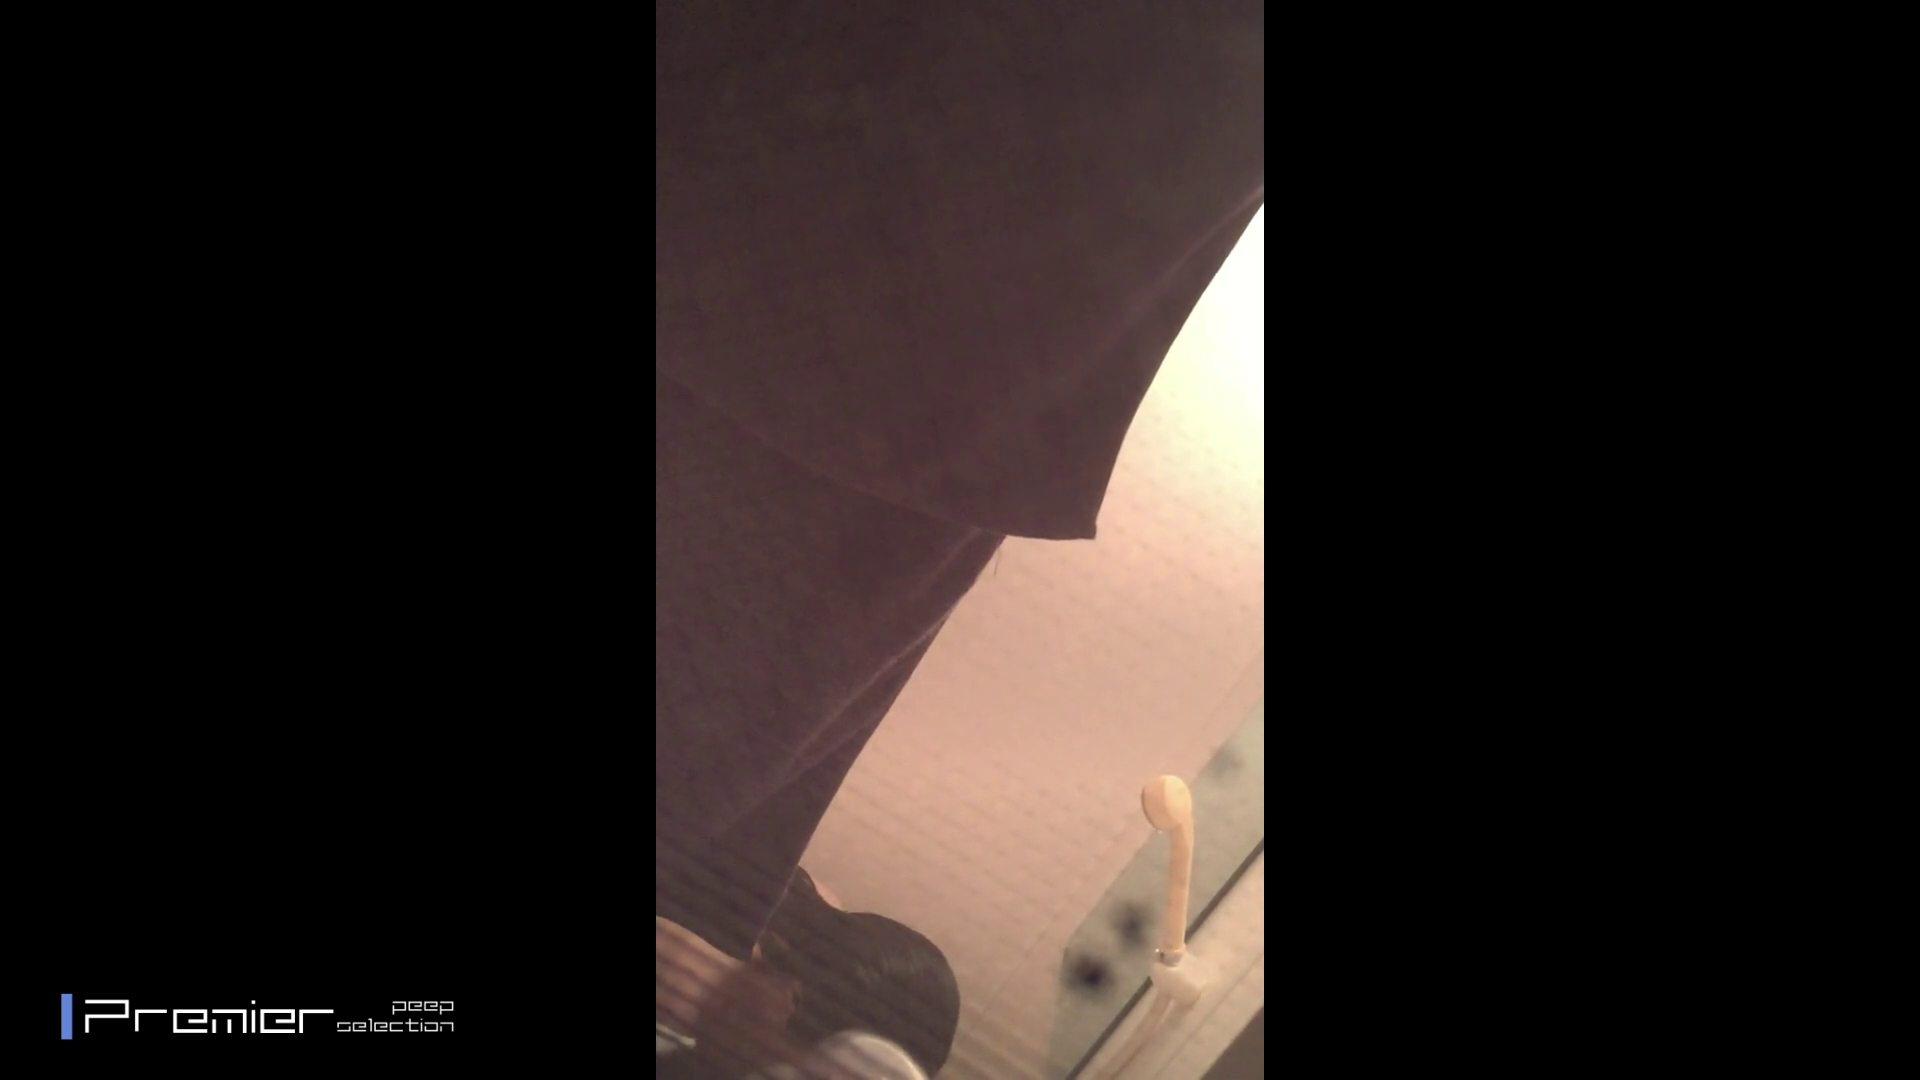 ★永久保存版★全員バレ!大迫力入浴シーン 美女達の私生活に潜入! 入浴 性交動画流出 99枚 29